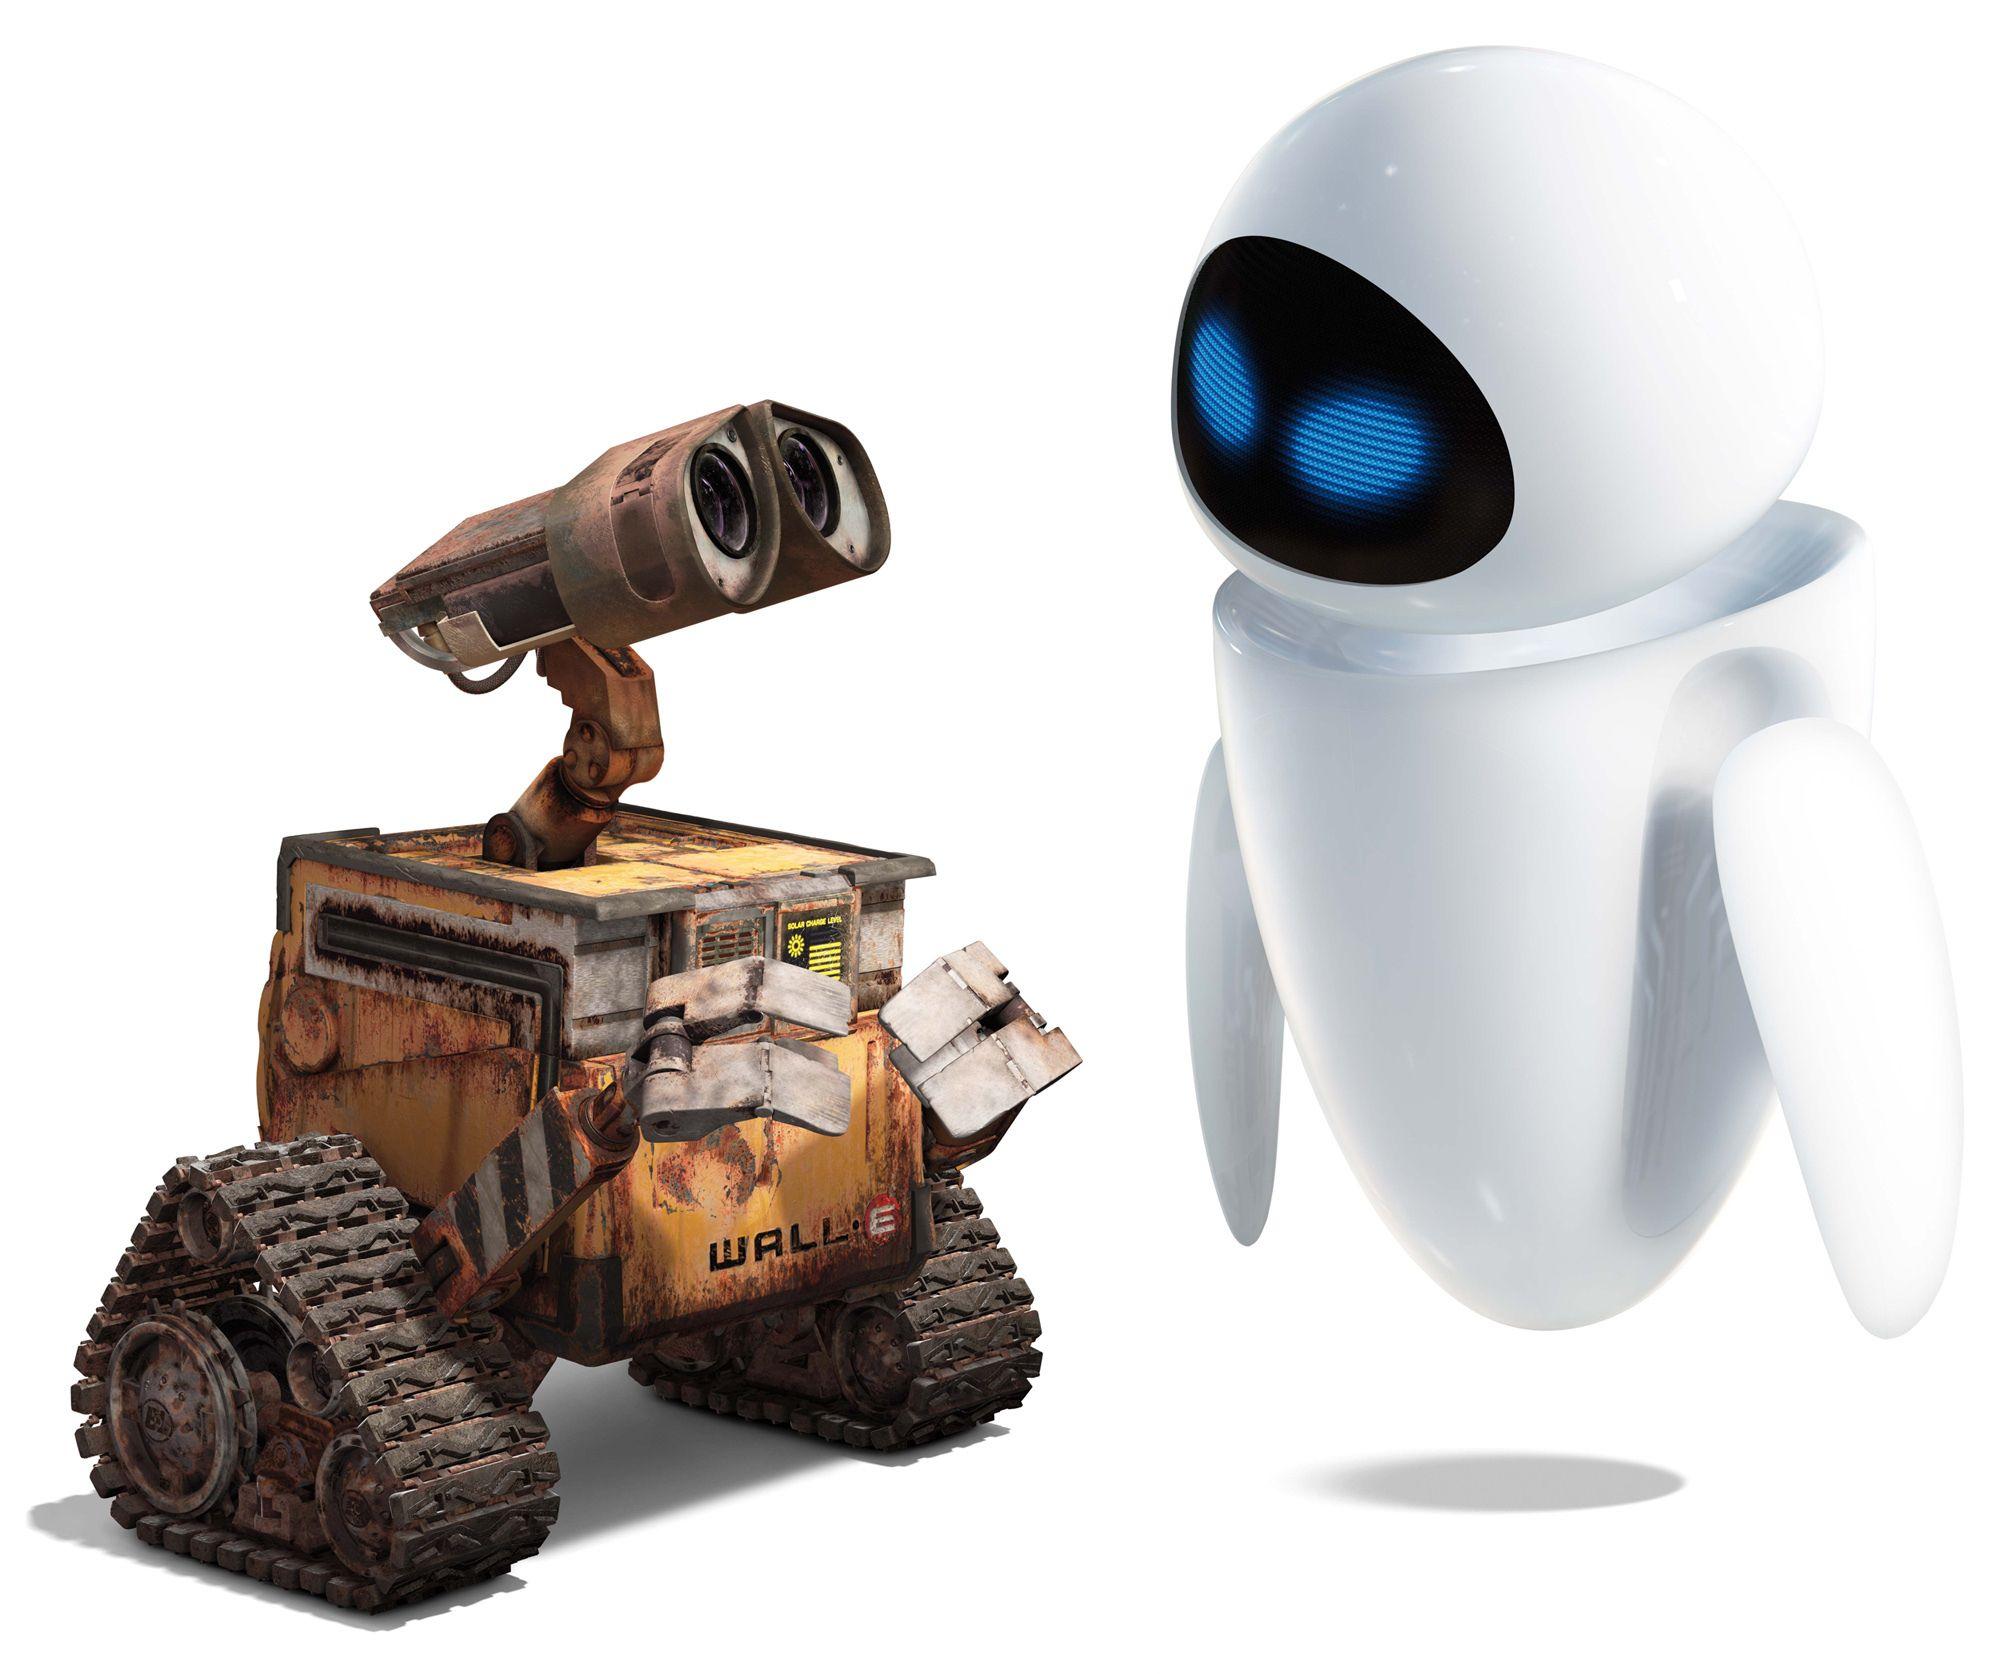 Download Wallpaper Cartoon White Robot Love Free Desktop Wallpaper In The Resolution 2000x1674 Picture 33 Wall E Peliculas Completas Imagenes De Monos